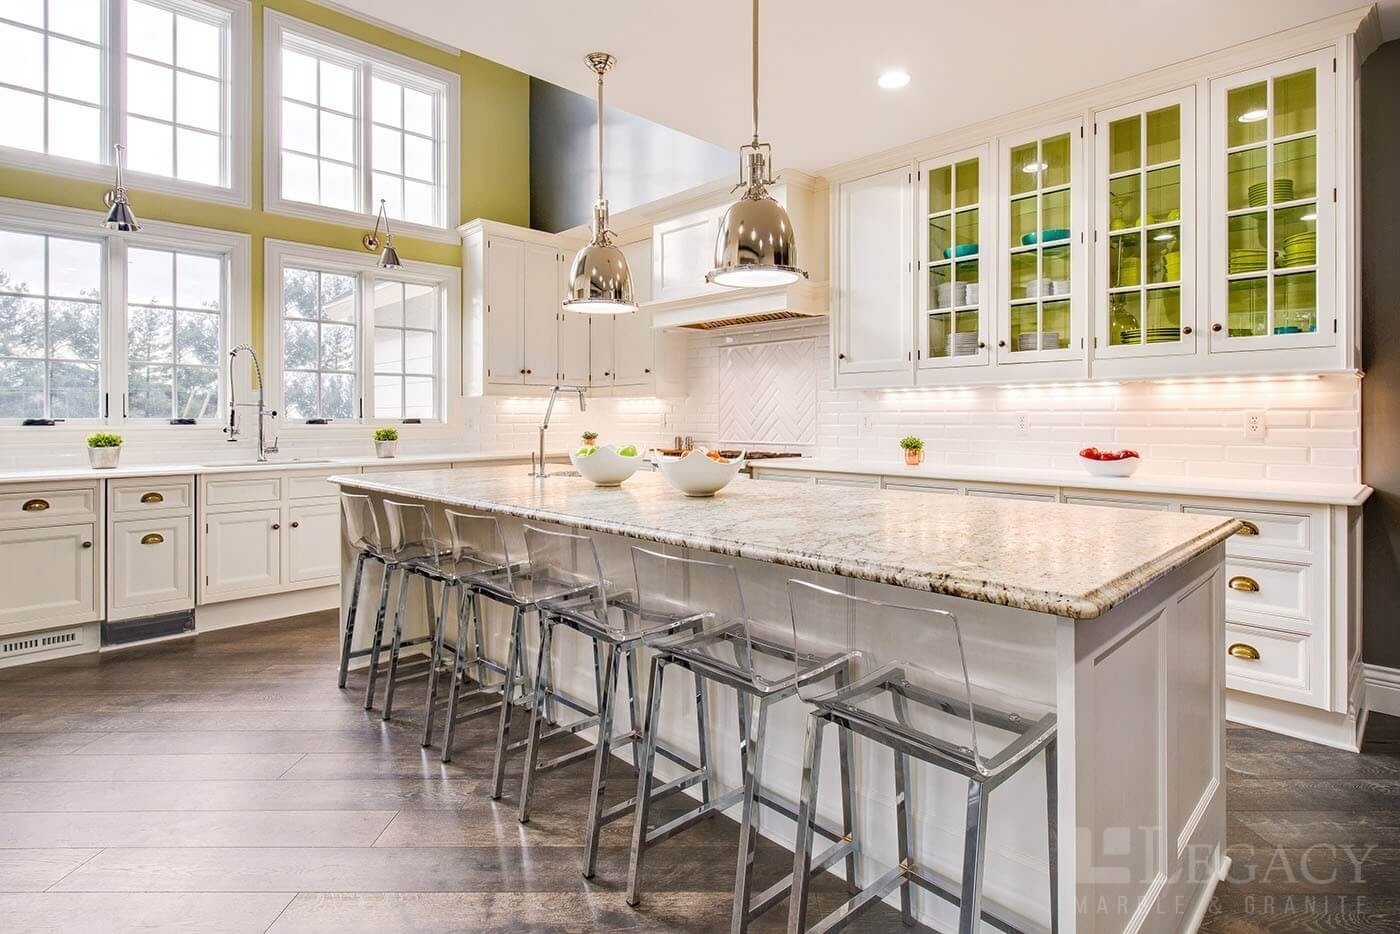 Looking Kitchen Countertops Lima | Legacymarbleandgranite.com